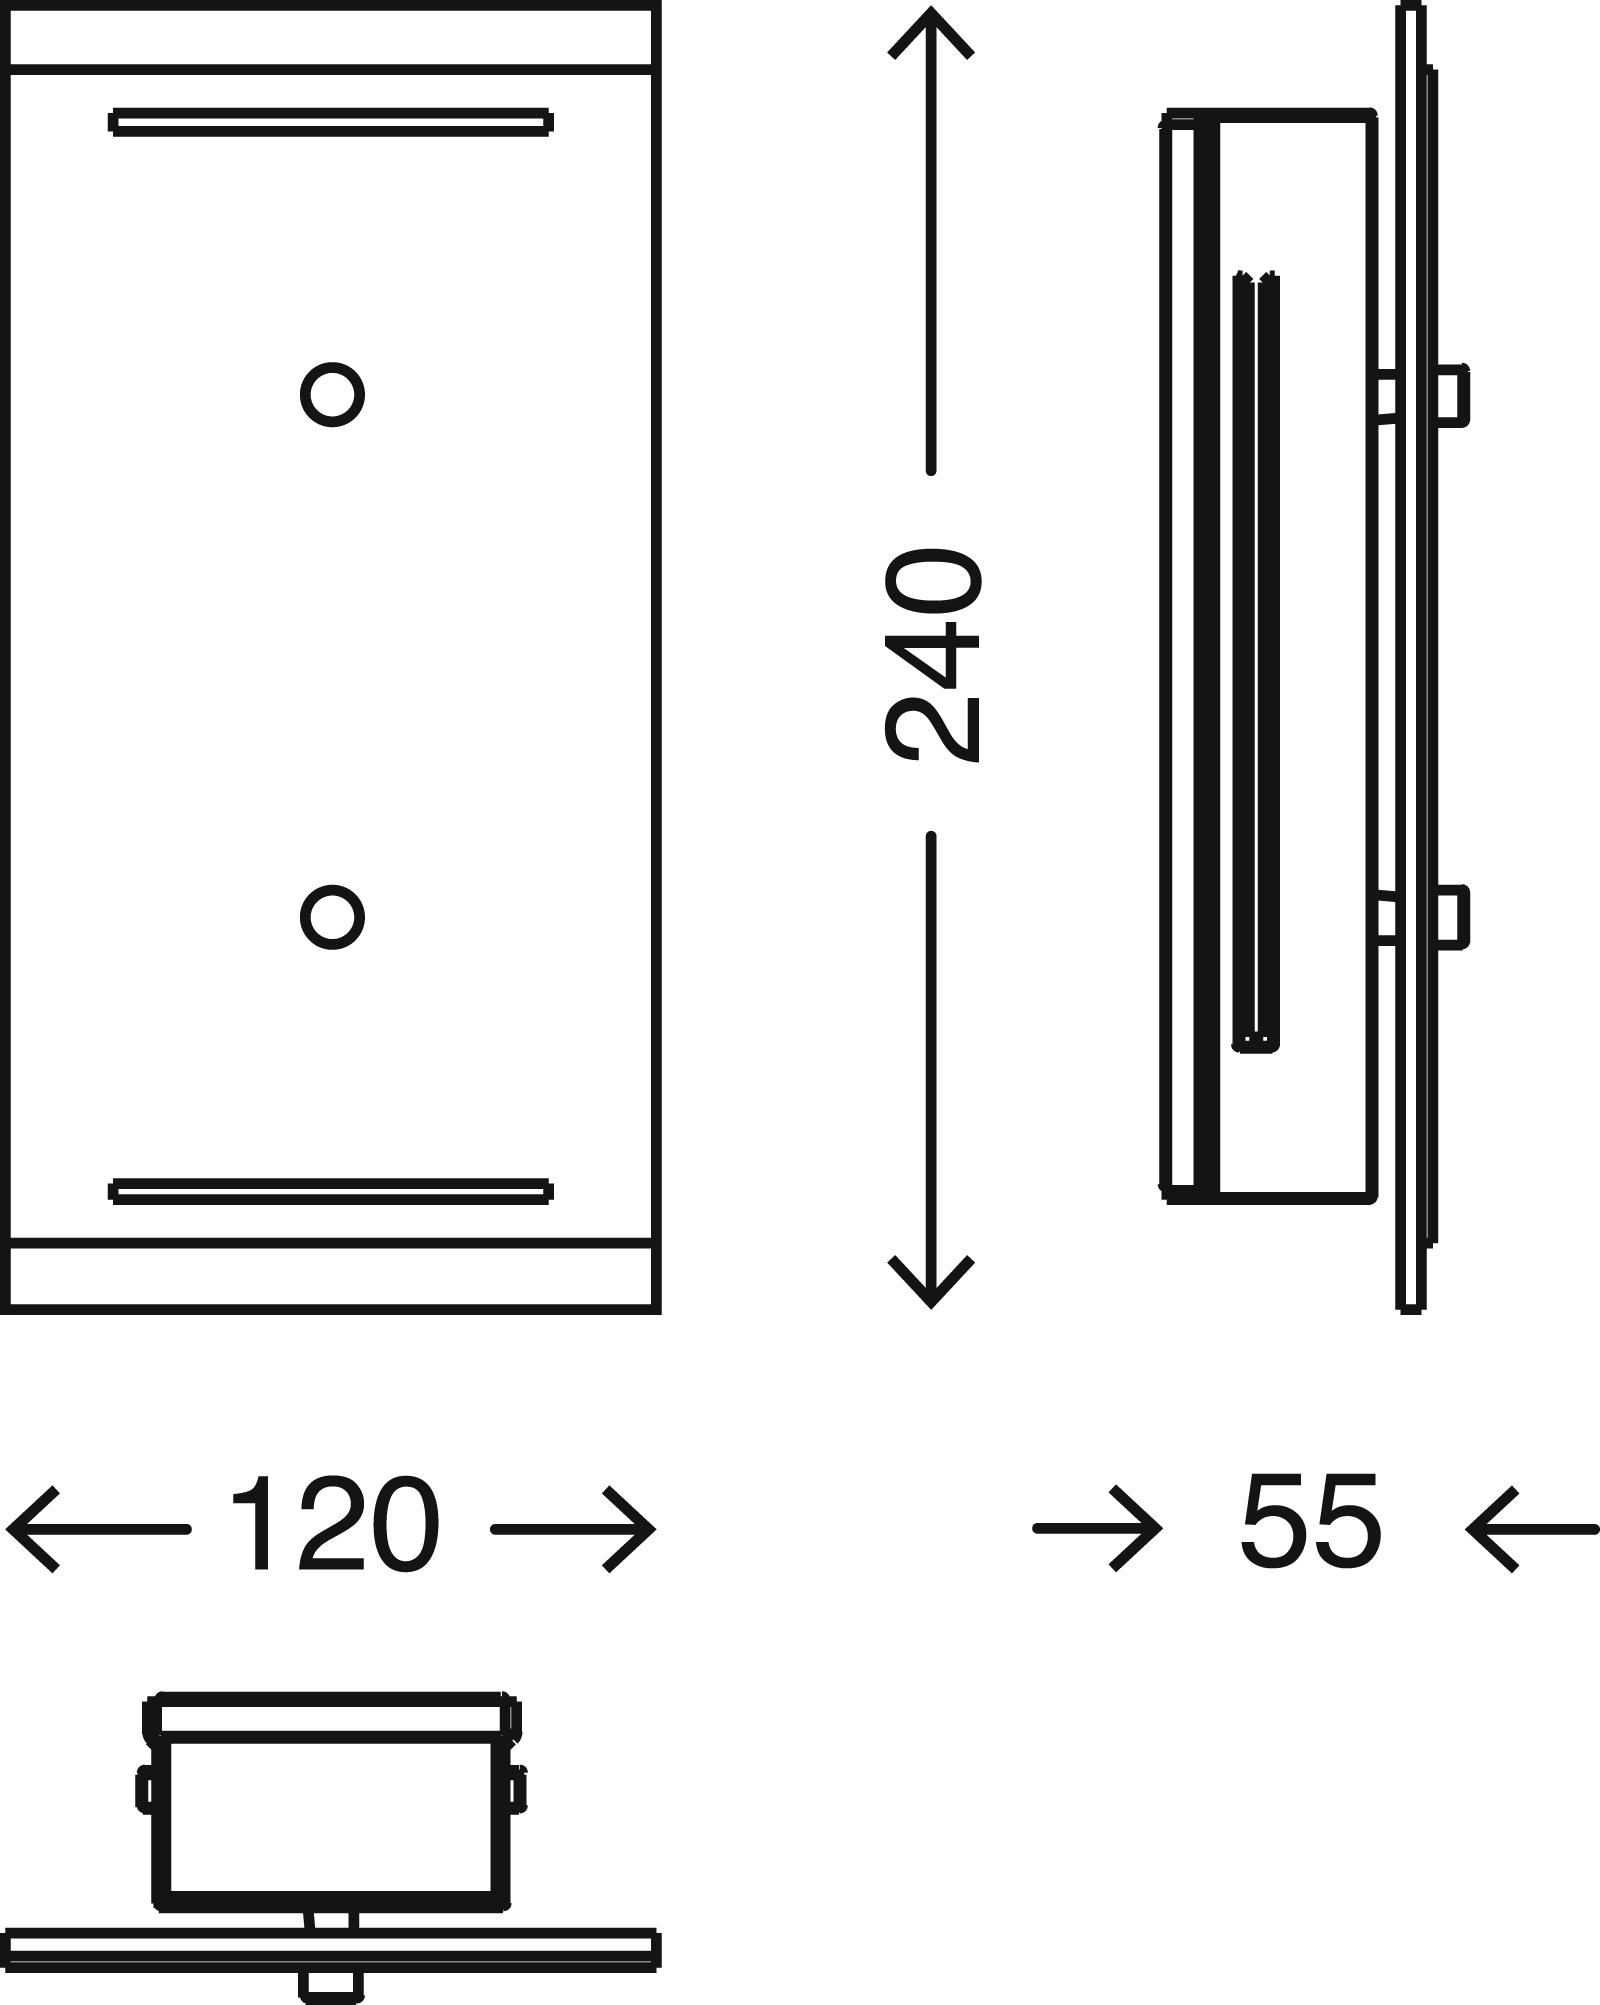 TELEFUNKEN LED Aussenleuchte, 24 cm, 7,5 W, Anthrazit